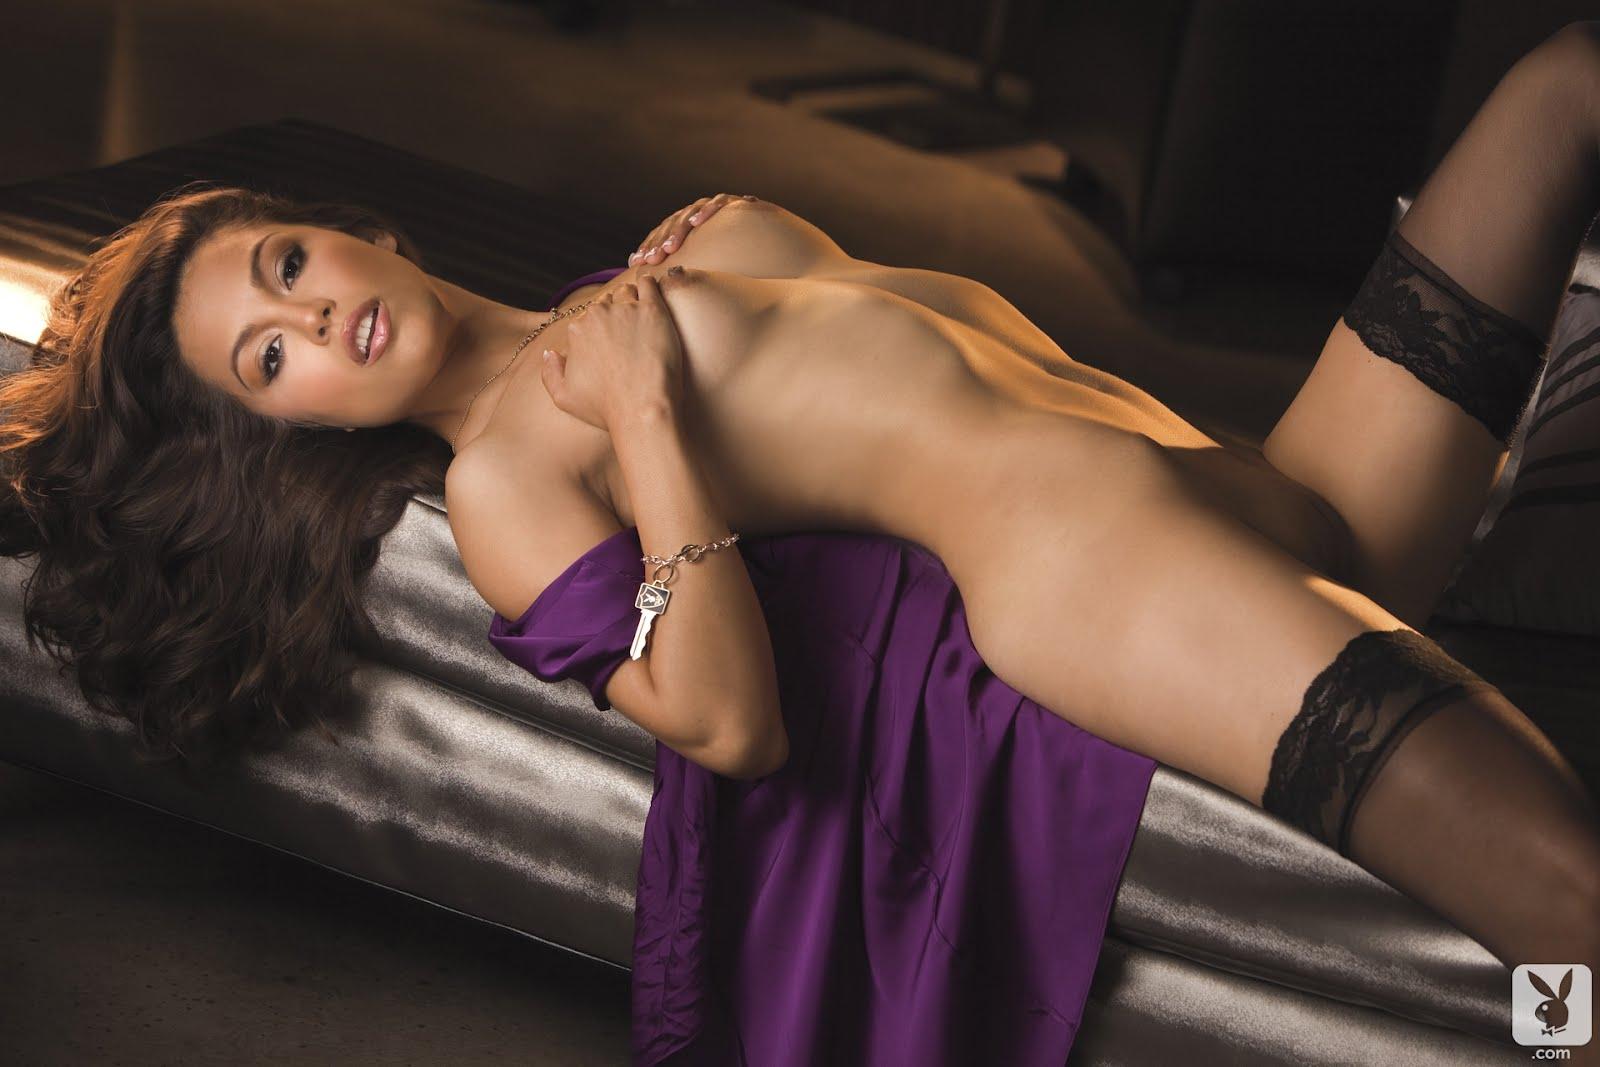 Porn Star Raquel 84